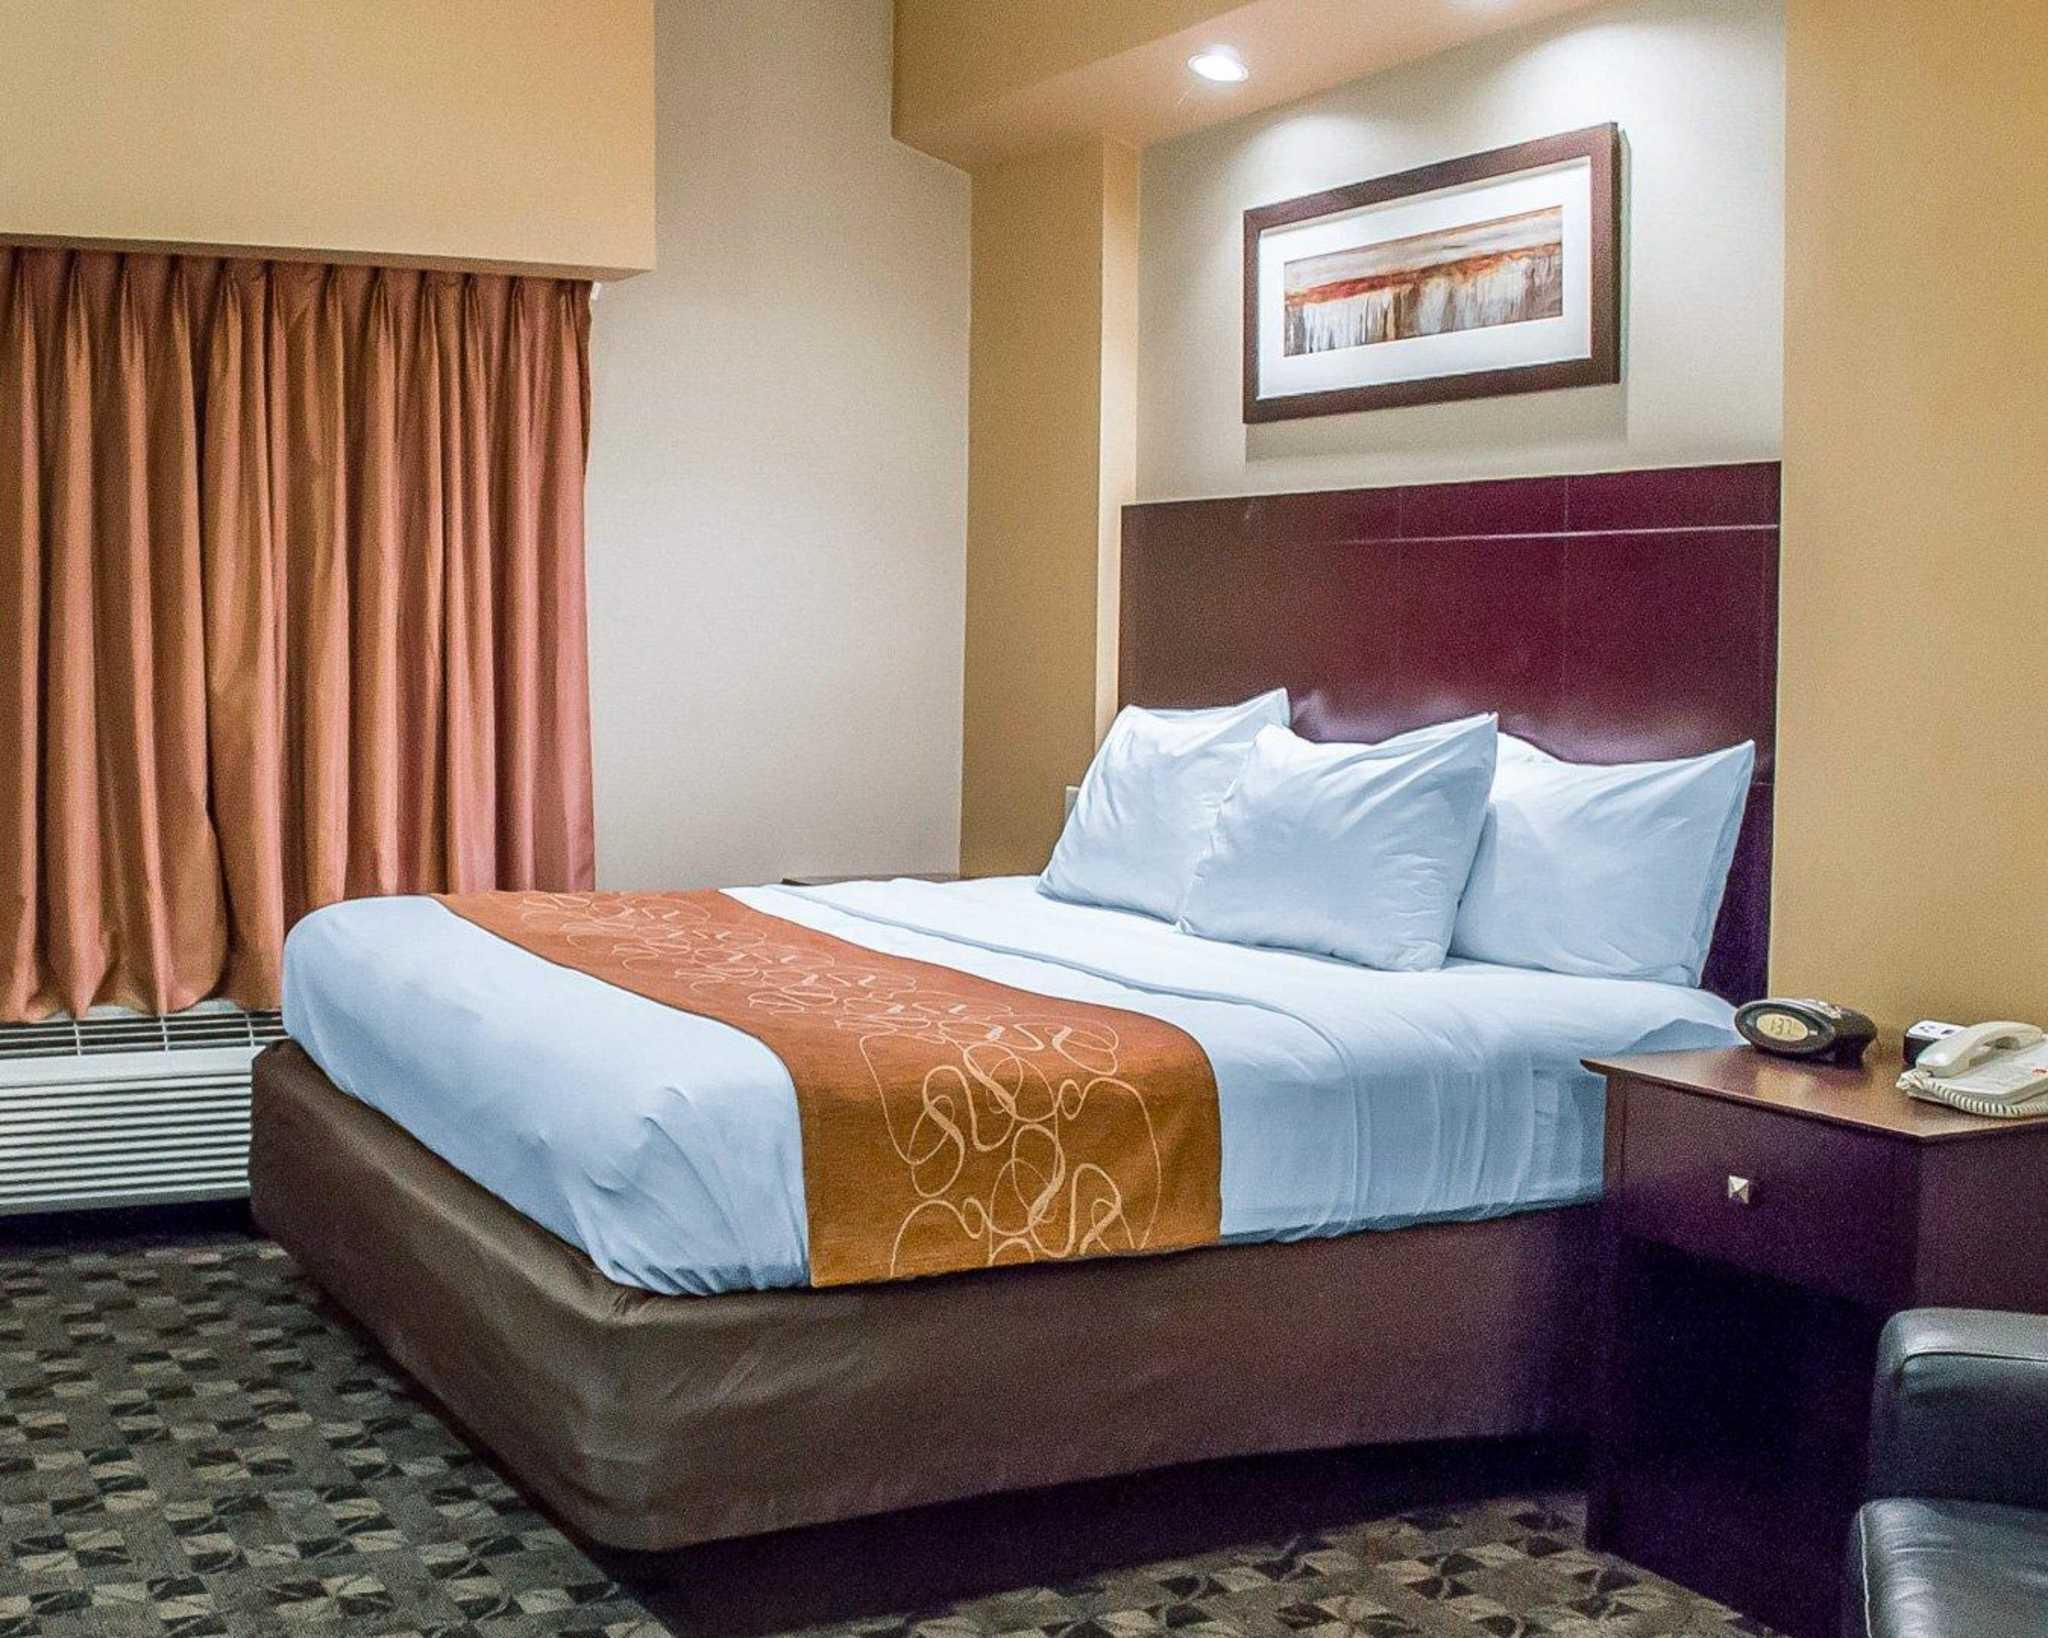 Comfort Suites Perrysburg - Toledo South image 16